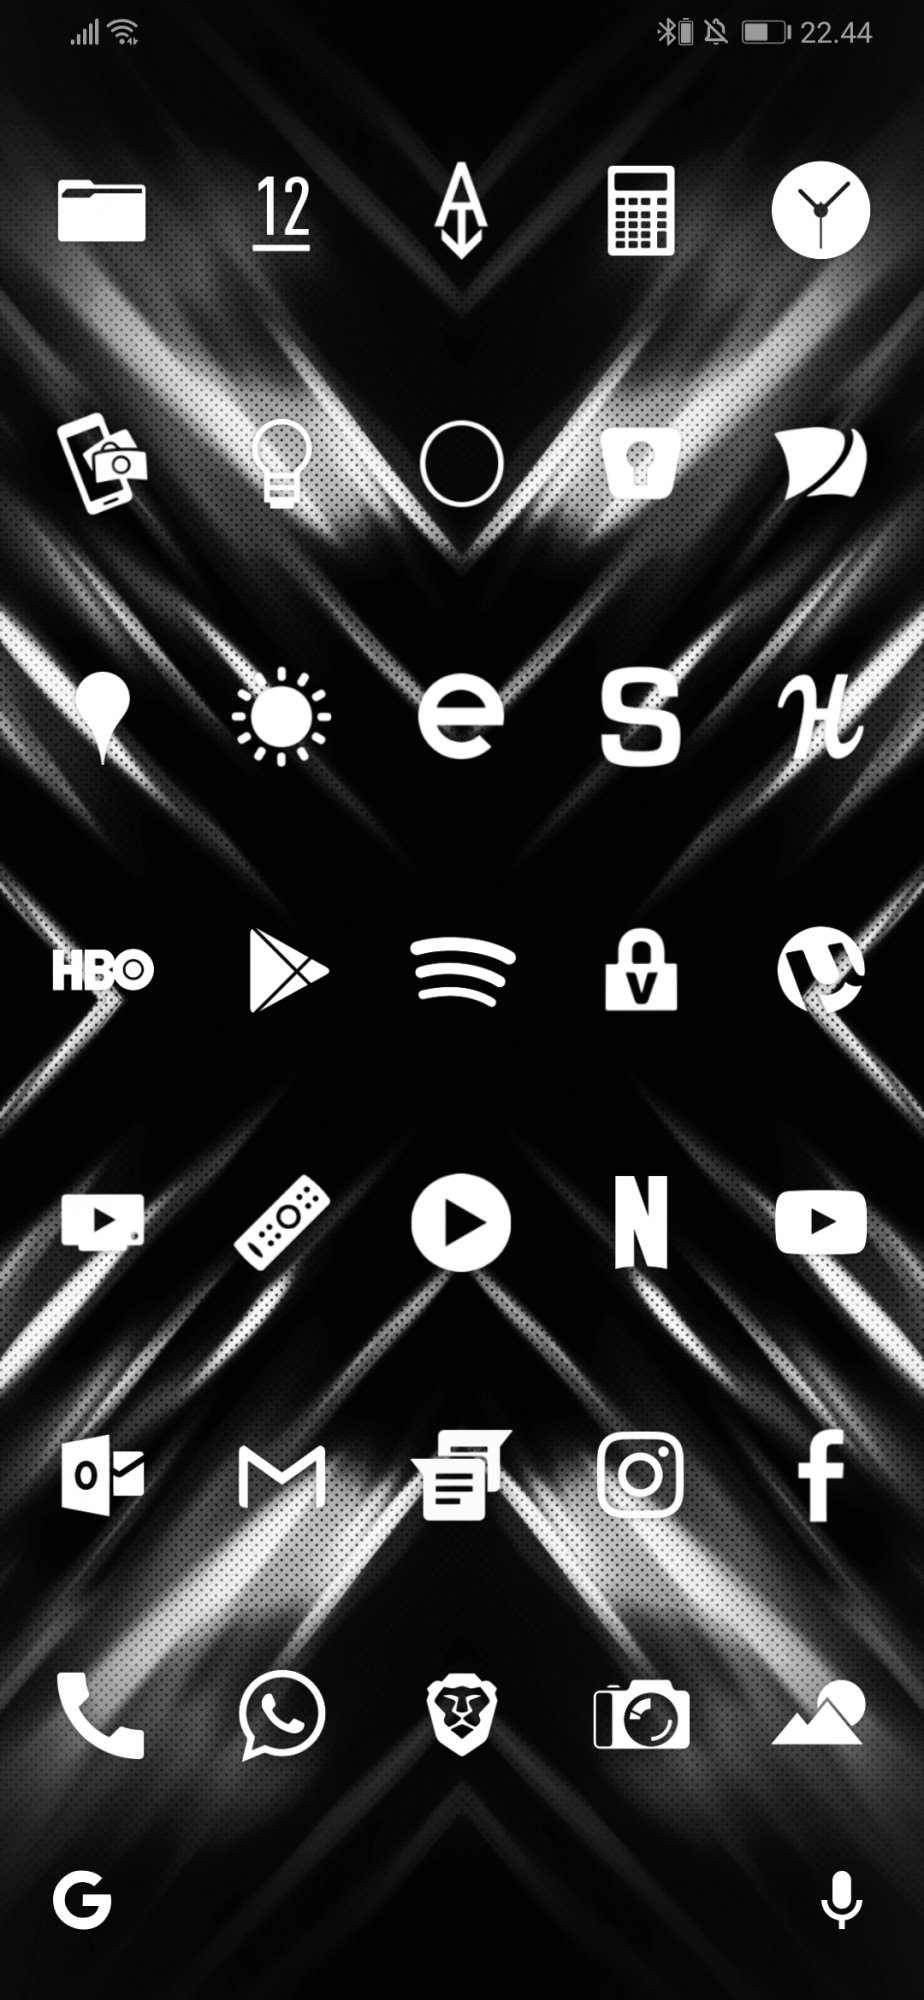 Screenshot_20190712_224402_com.teslacoilsw.launcher.jpg